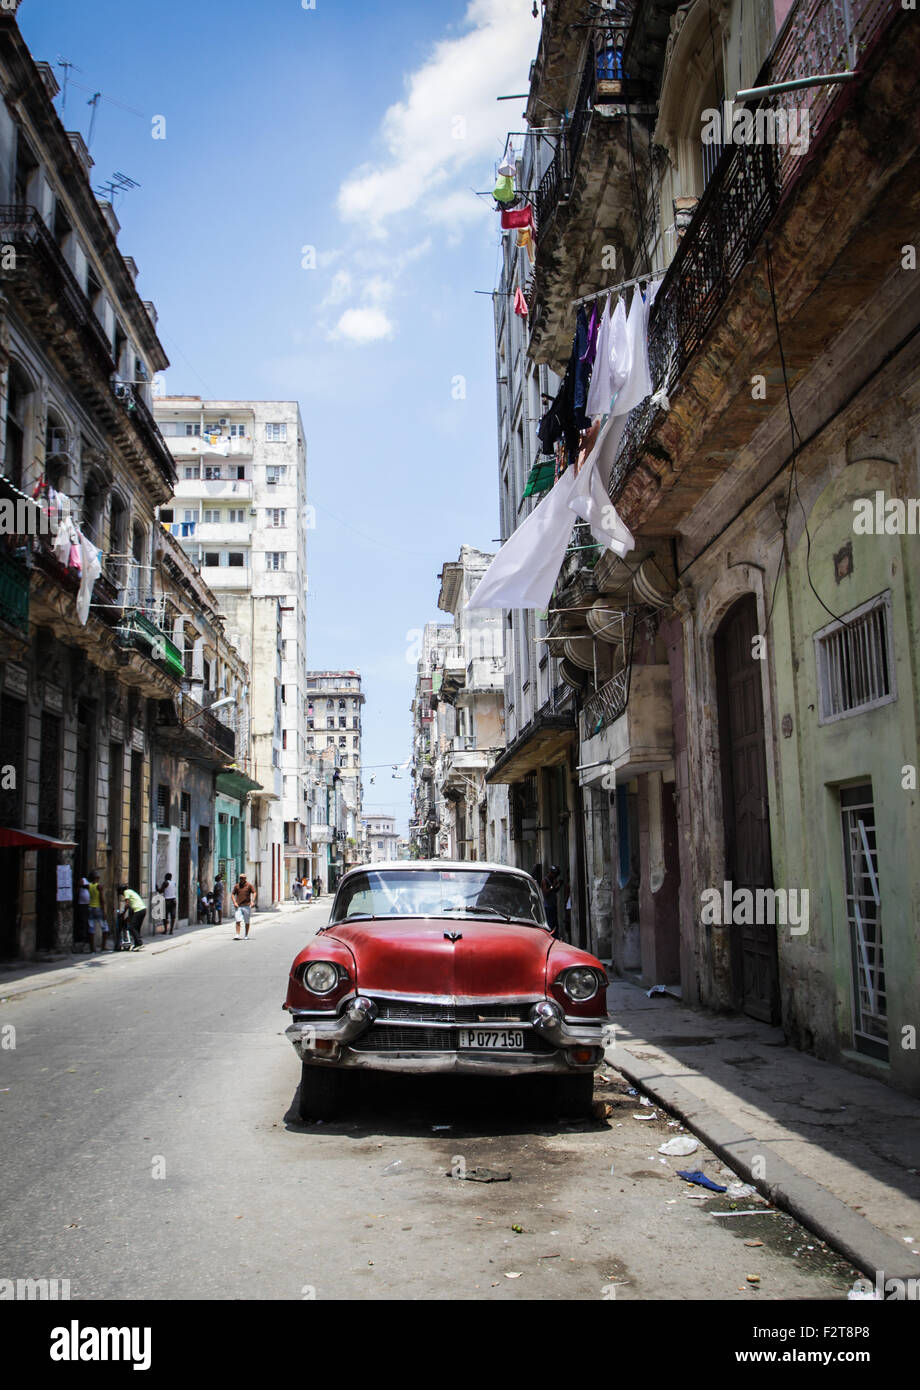 Coches clásicos de La Habana, Cuba Imagen De Stock